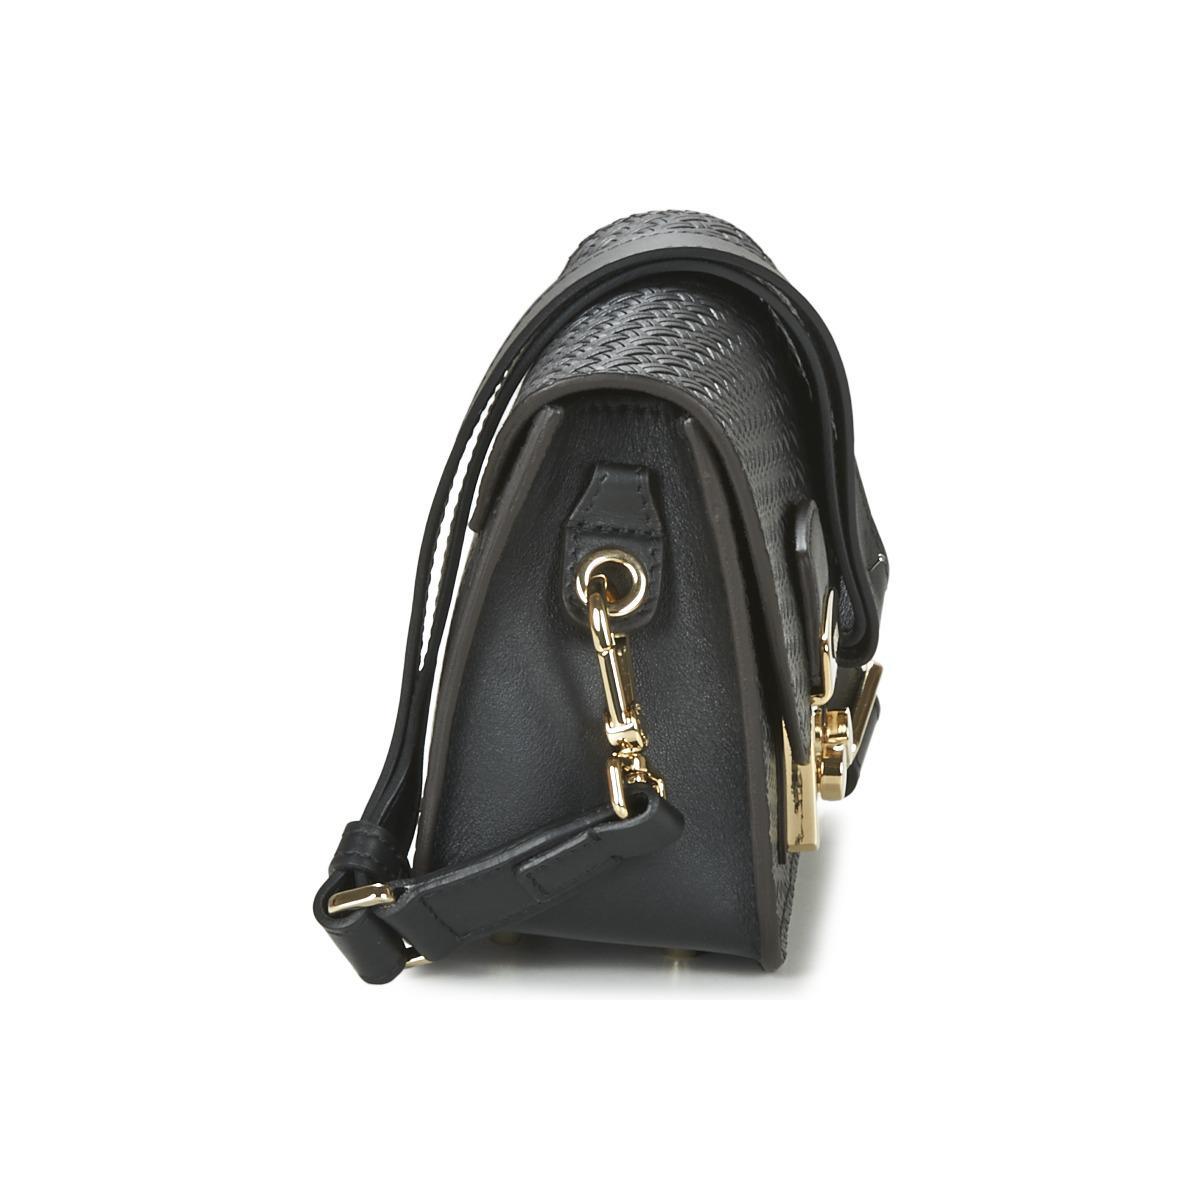 bfc4774c851 Furla Metropolis Gilda Mini Crossbody Women s Shoulder Bag In Black ...